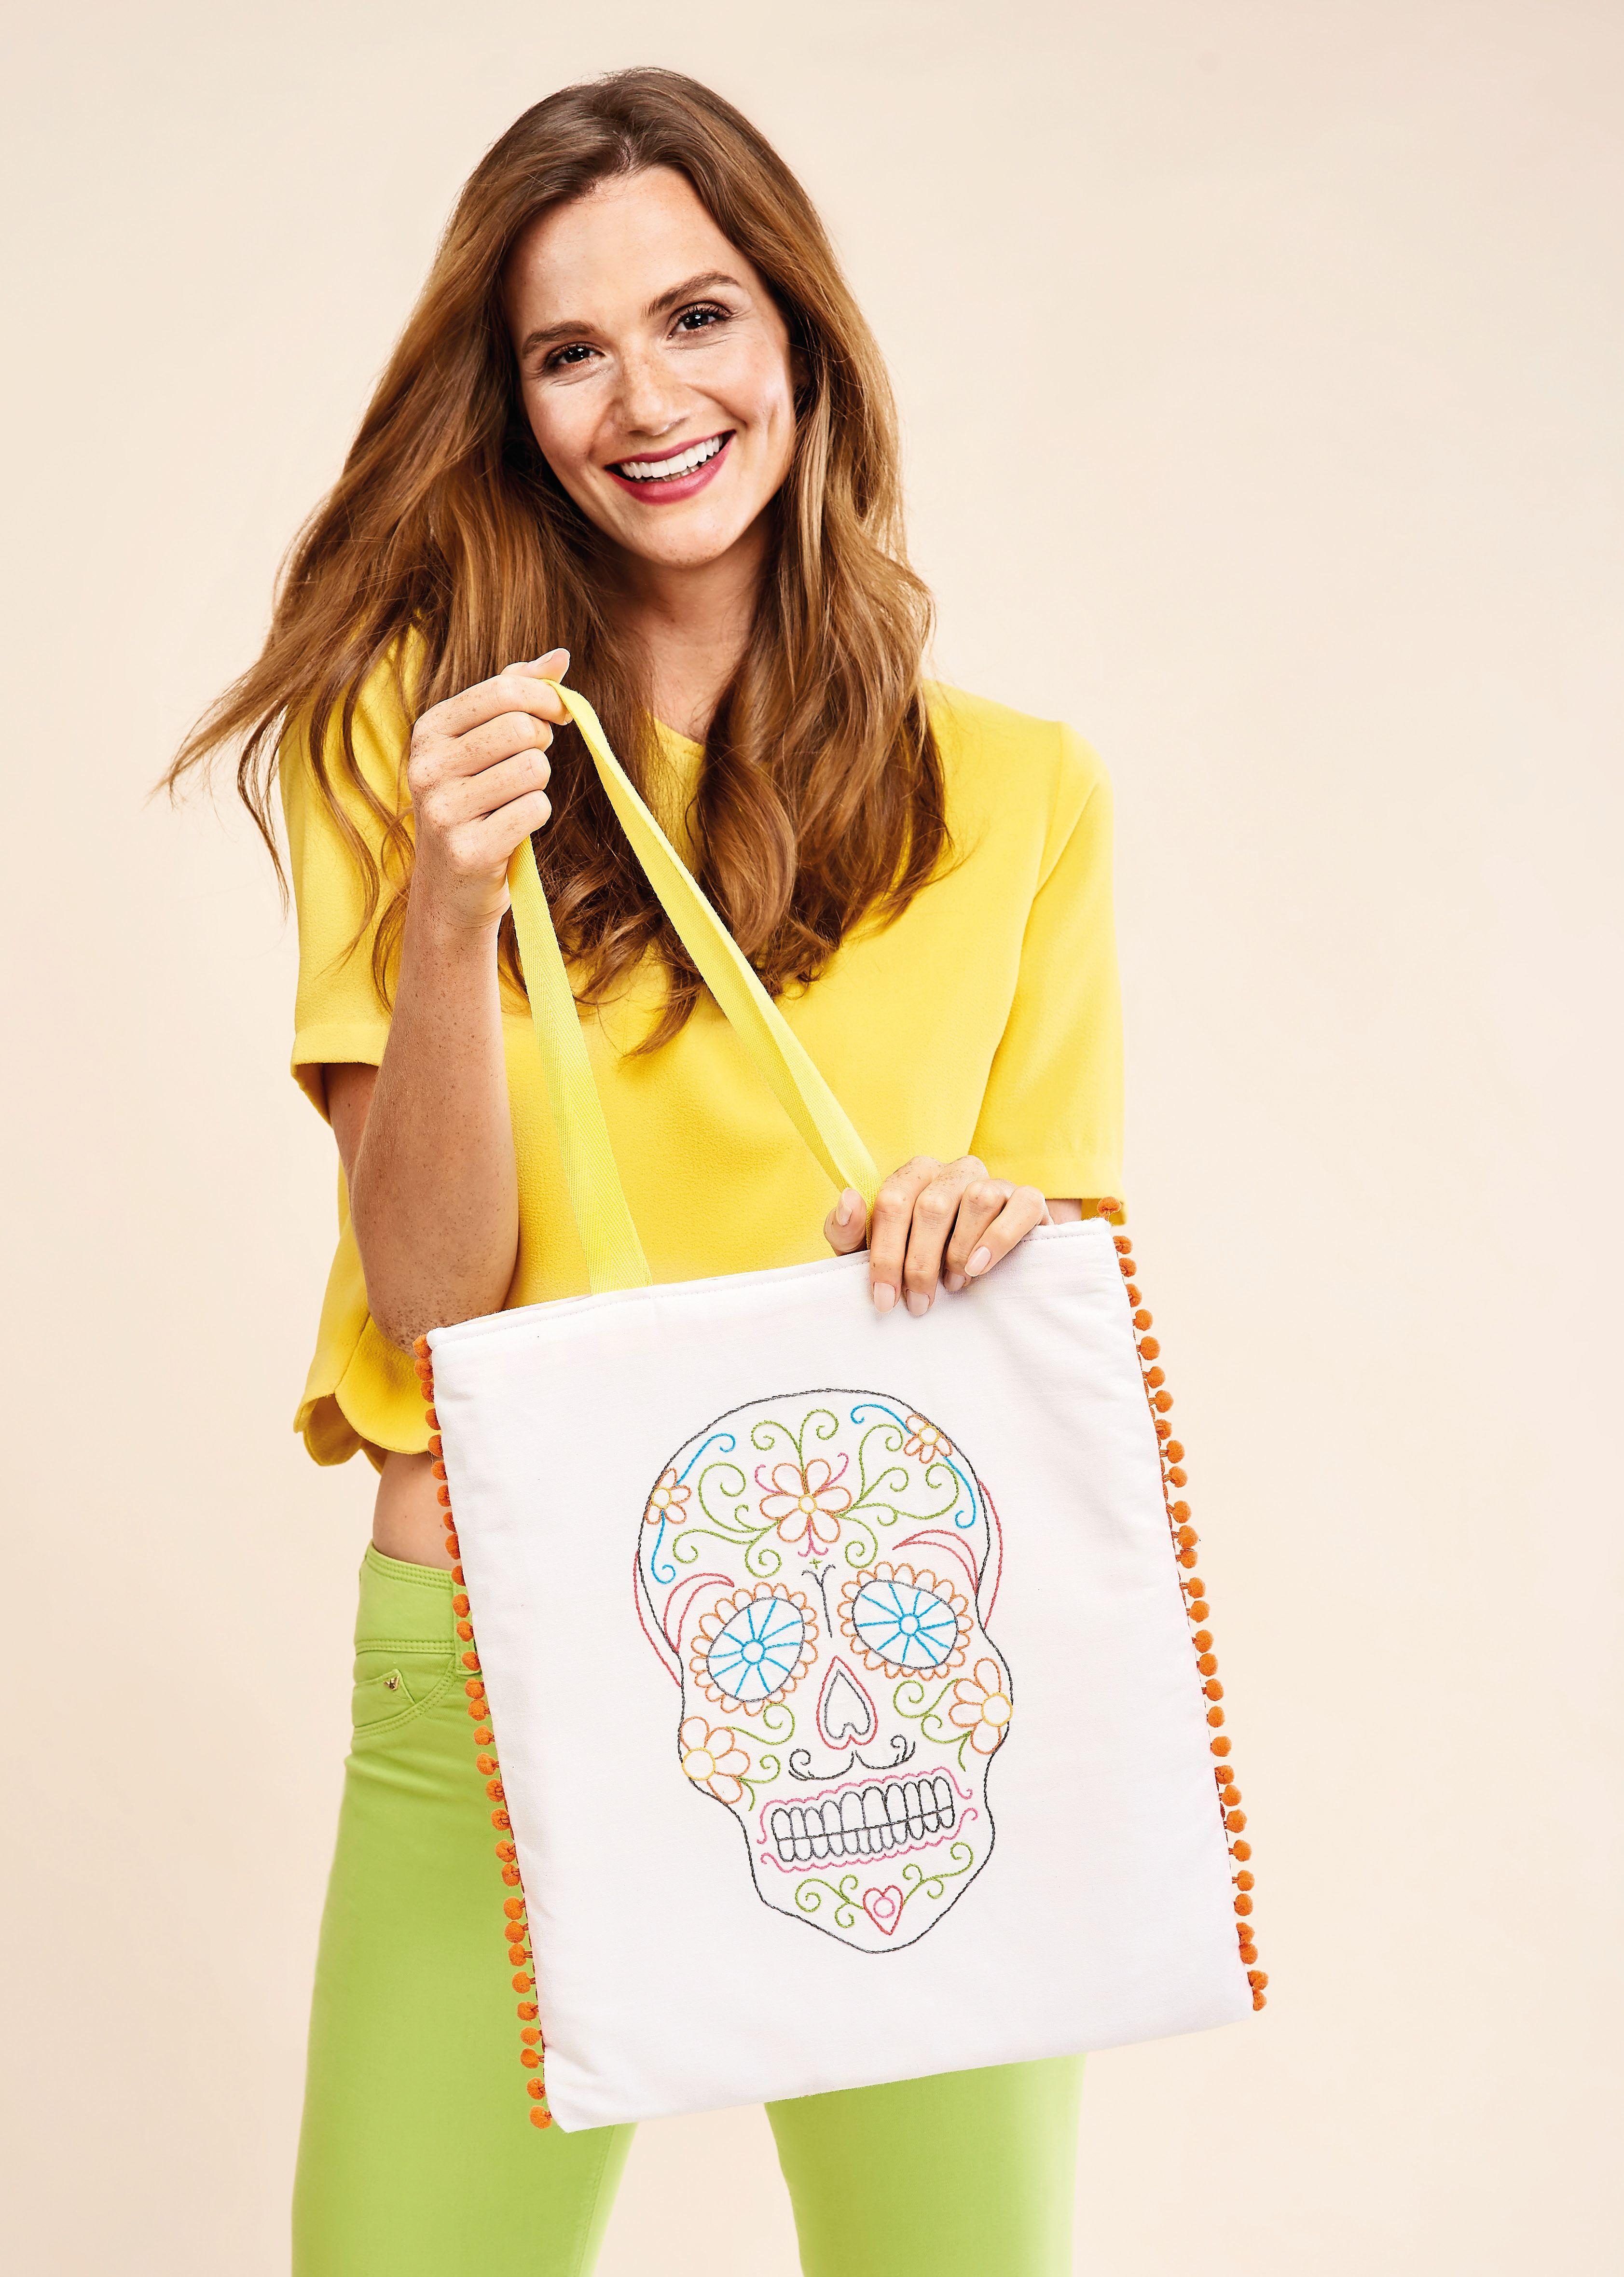 Cath Kidston Shoulder Bag - Magazine Templates - Sew Magazine